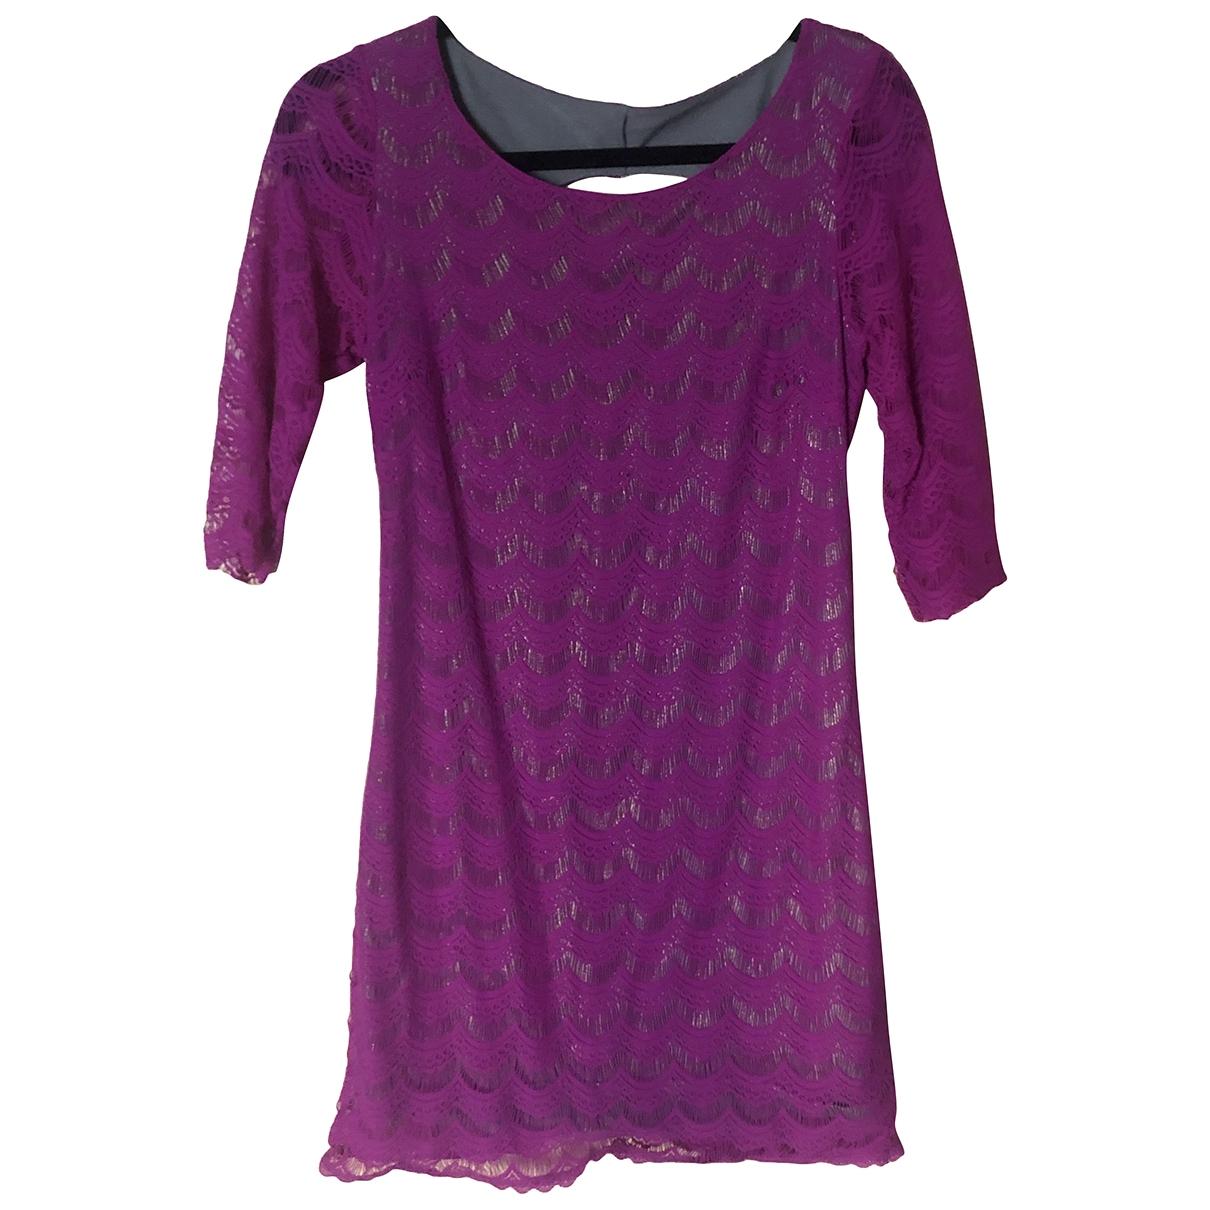 Free People \N Pink dress for Women S International